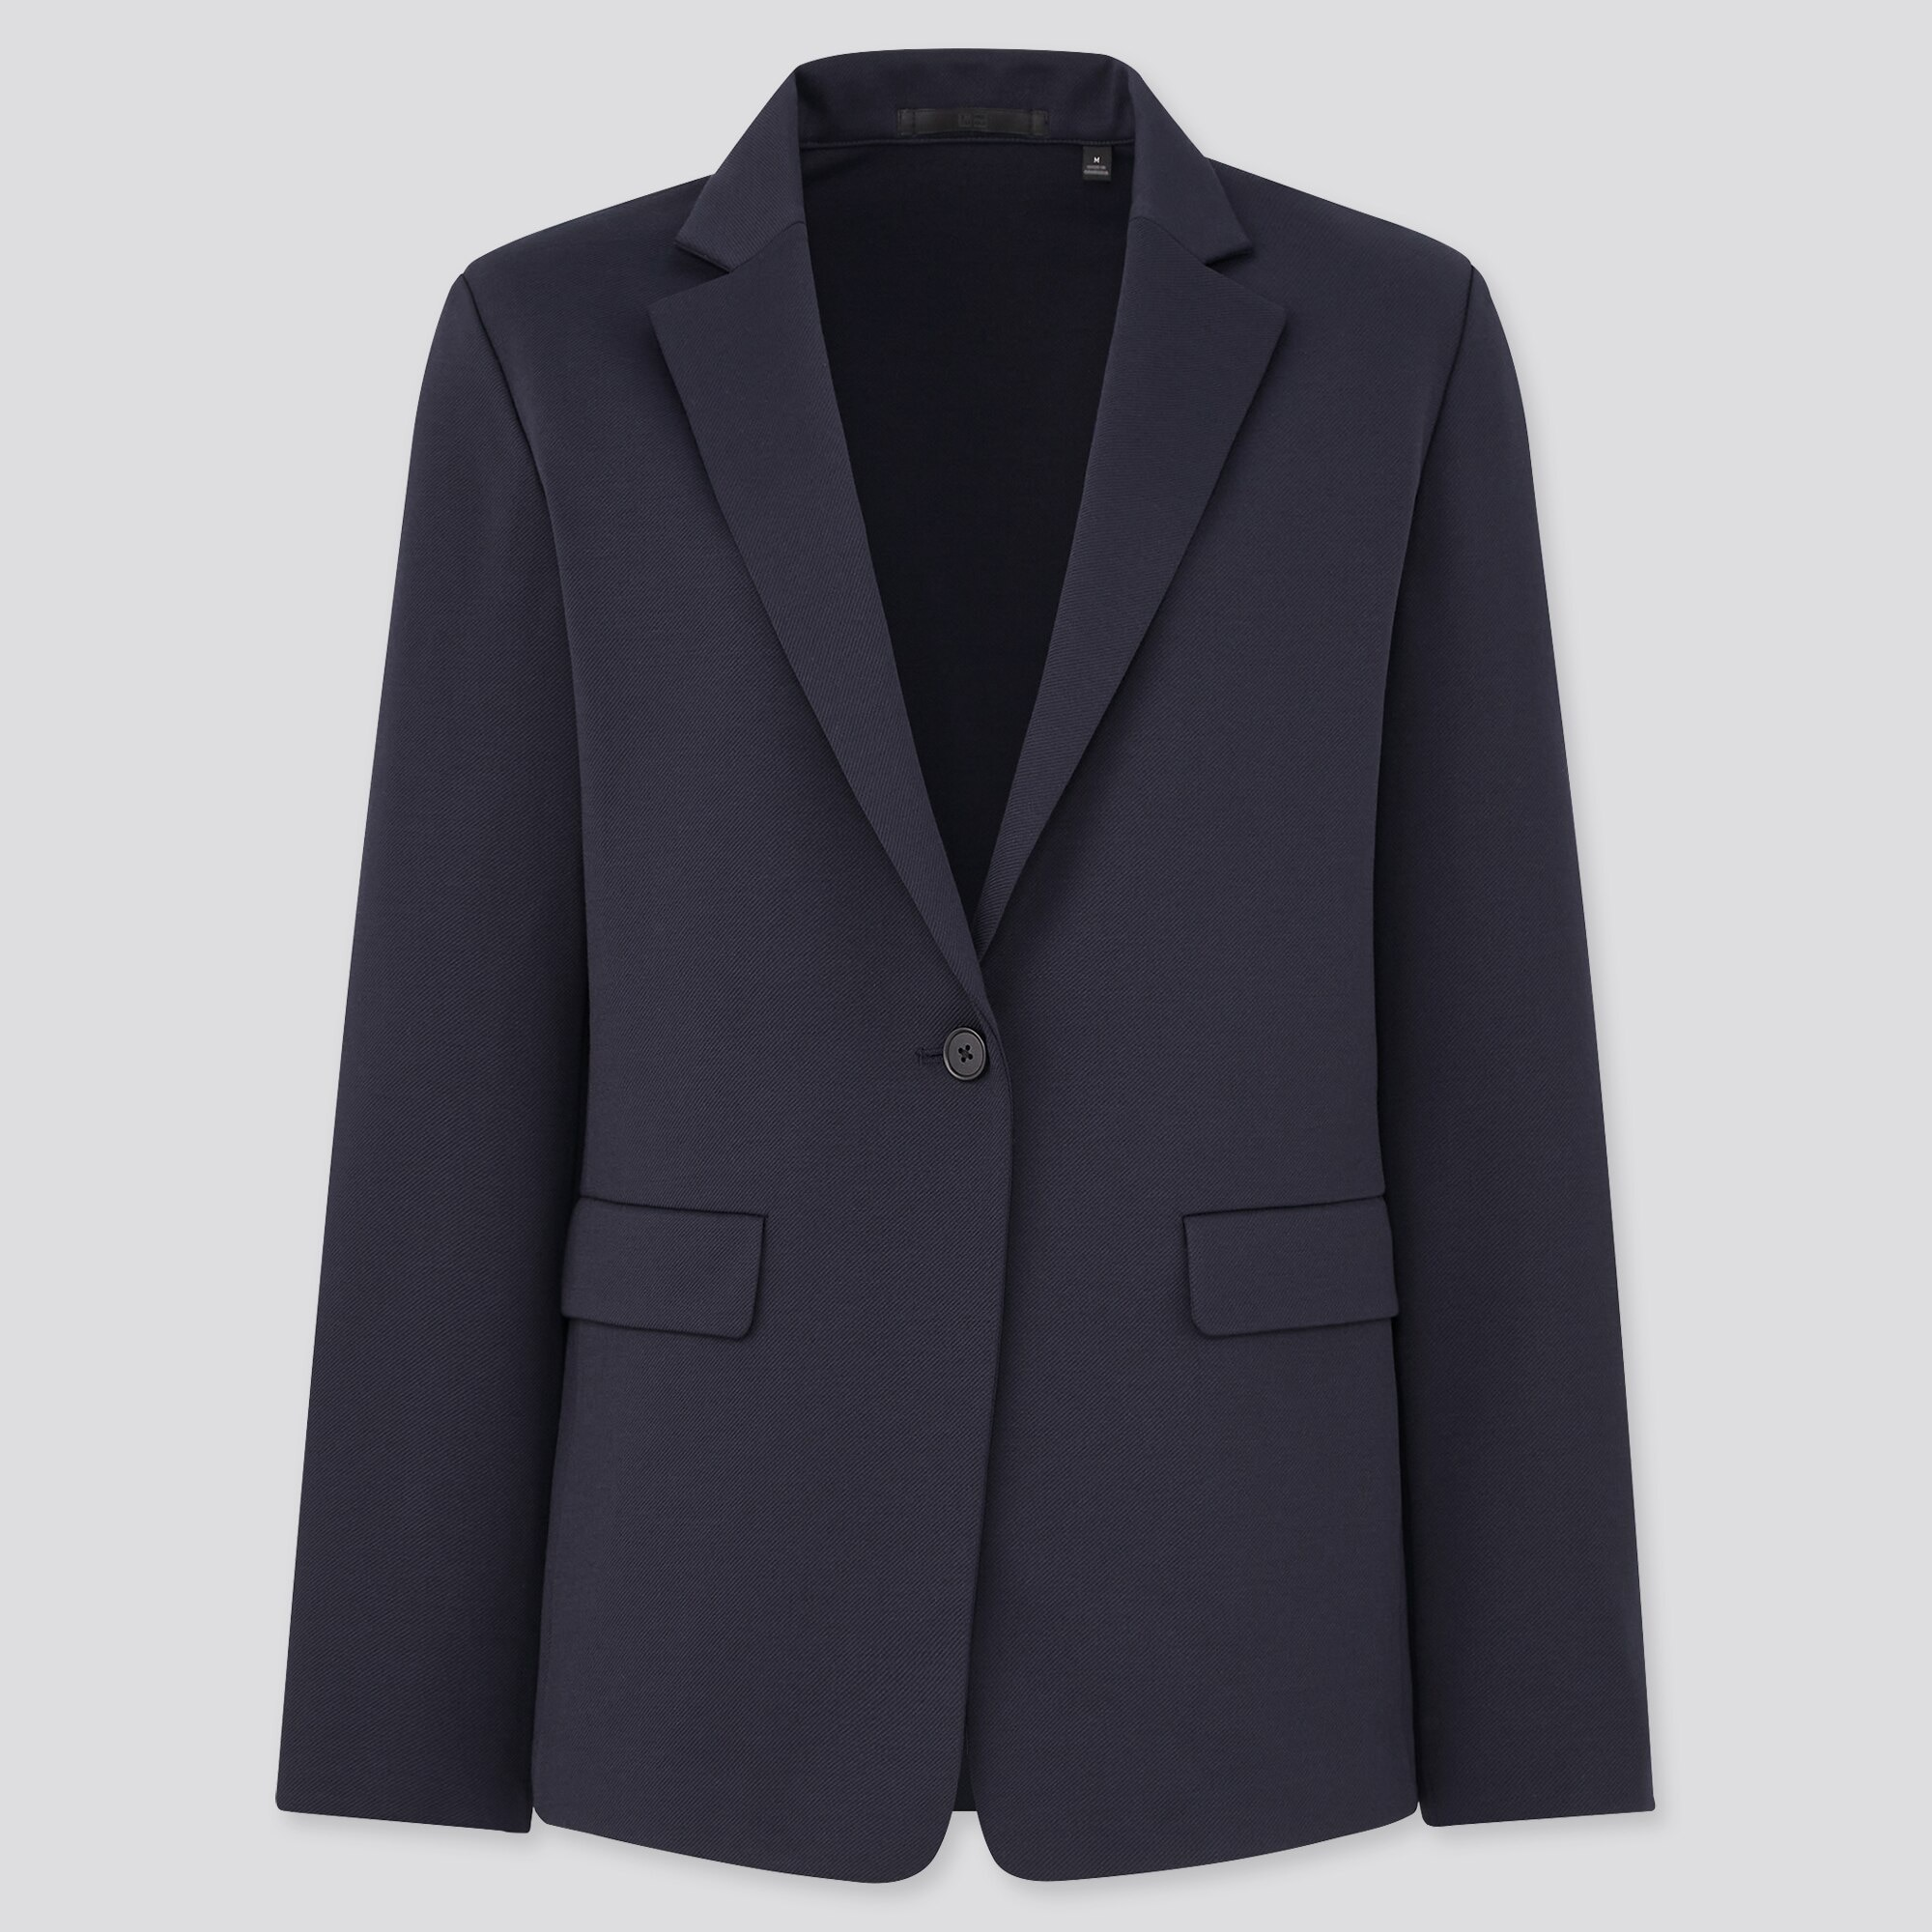 women UV Protection jersey jacket